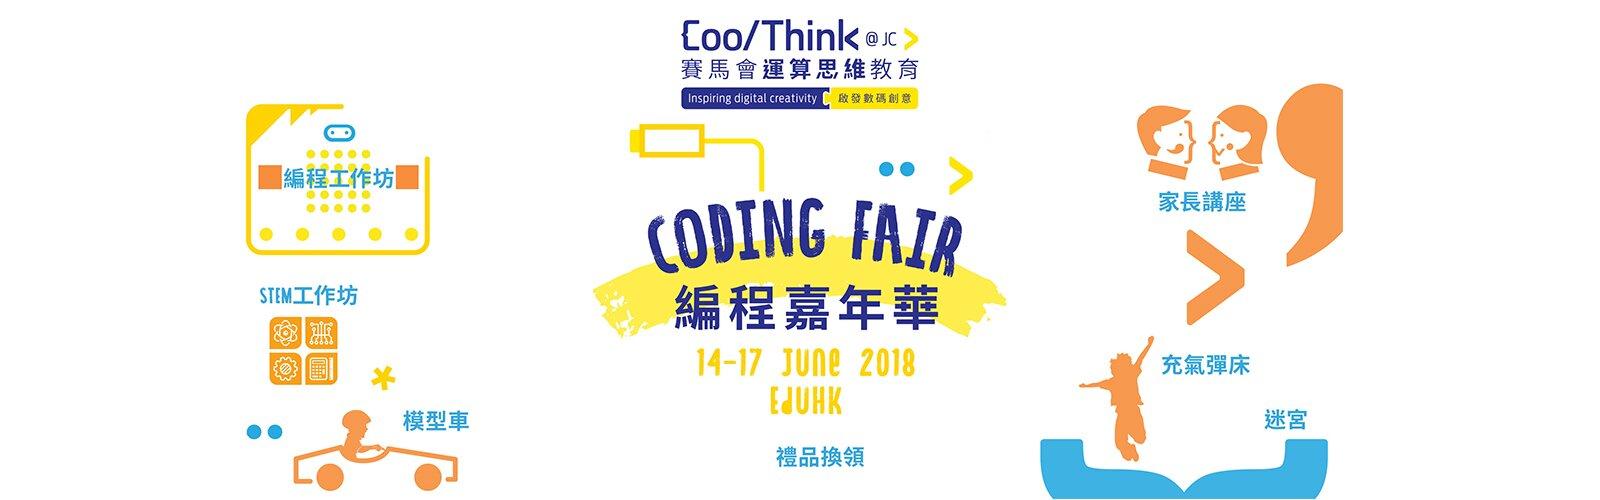 Coding Fair @EdUHK